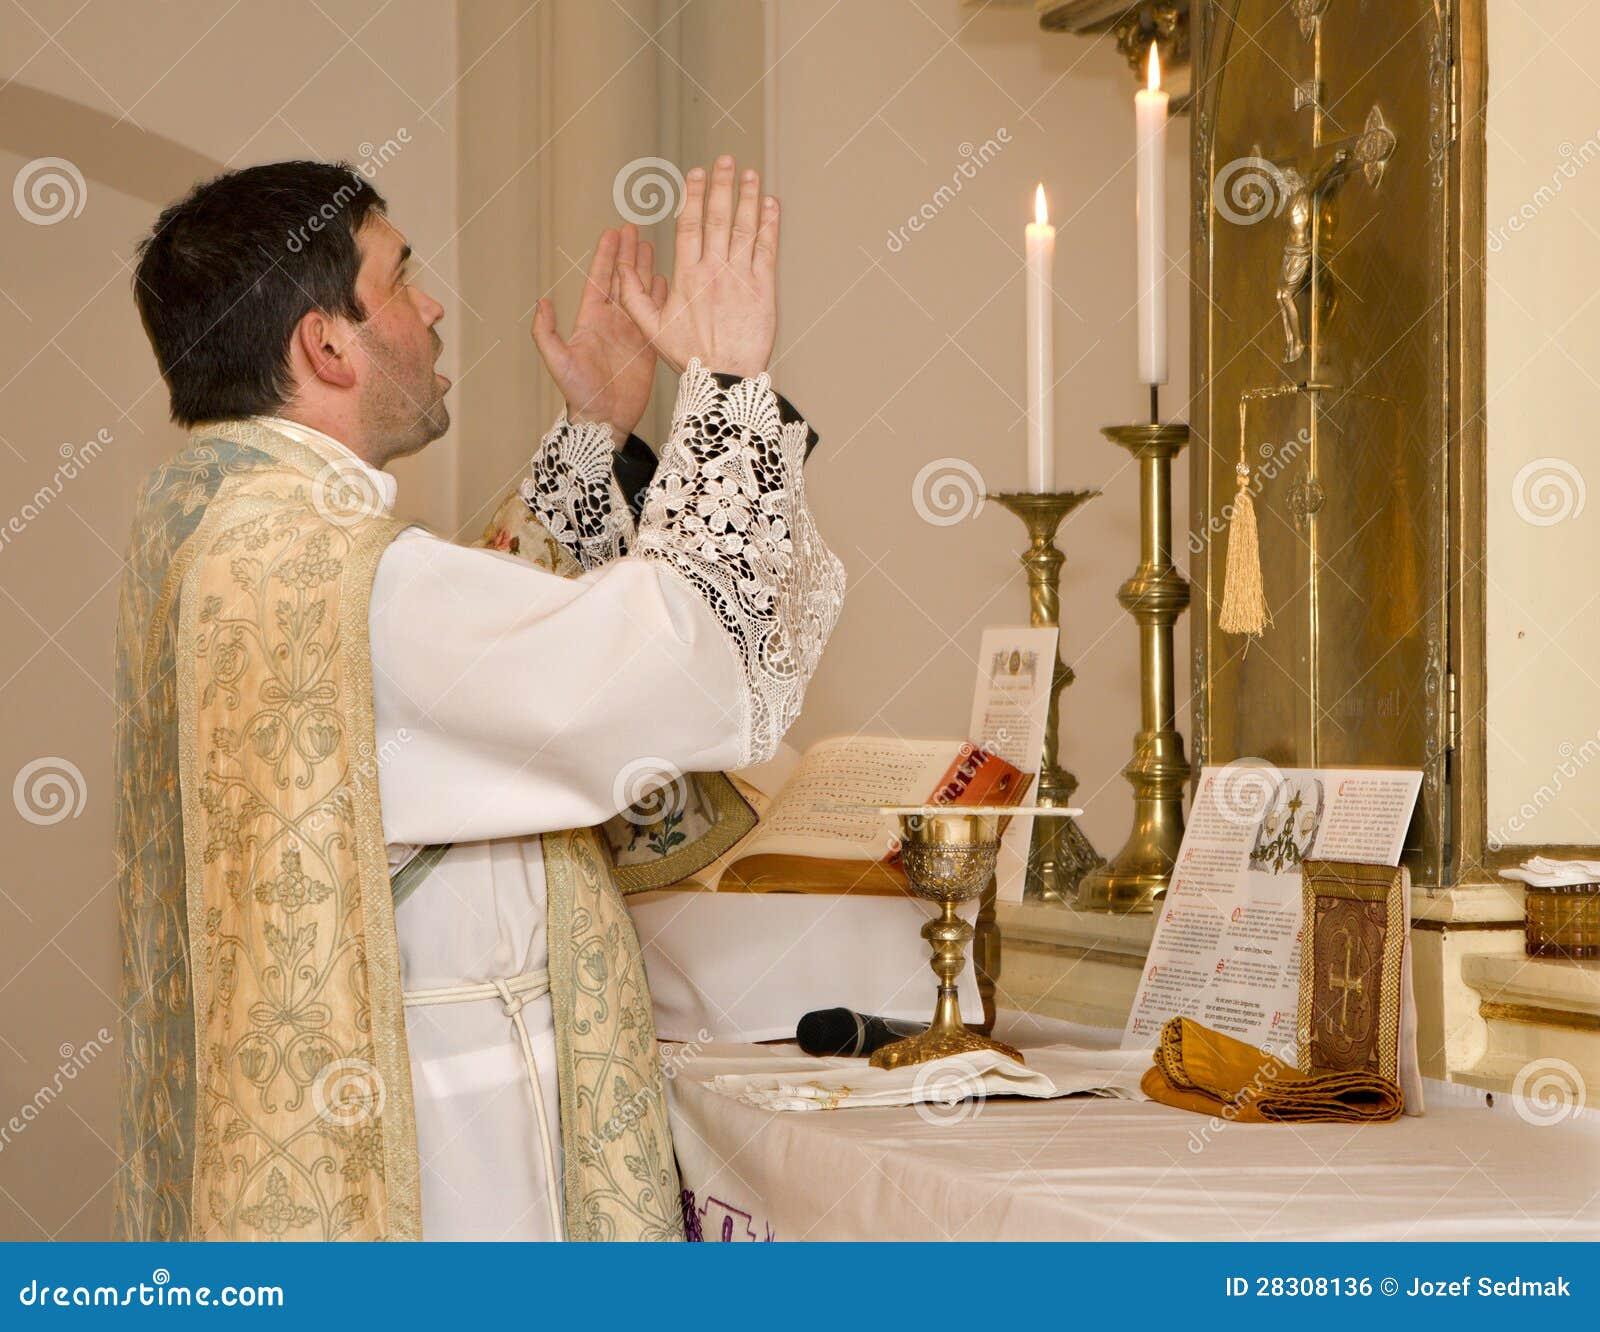 Catholic Priest At Tridentine Mass Stock Photo - Image of